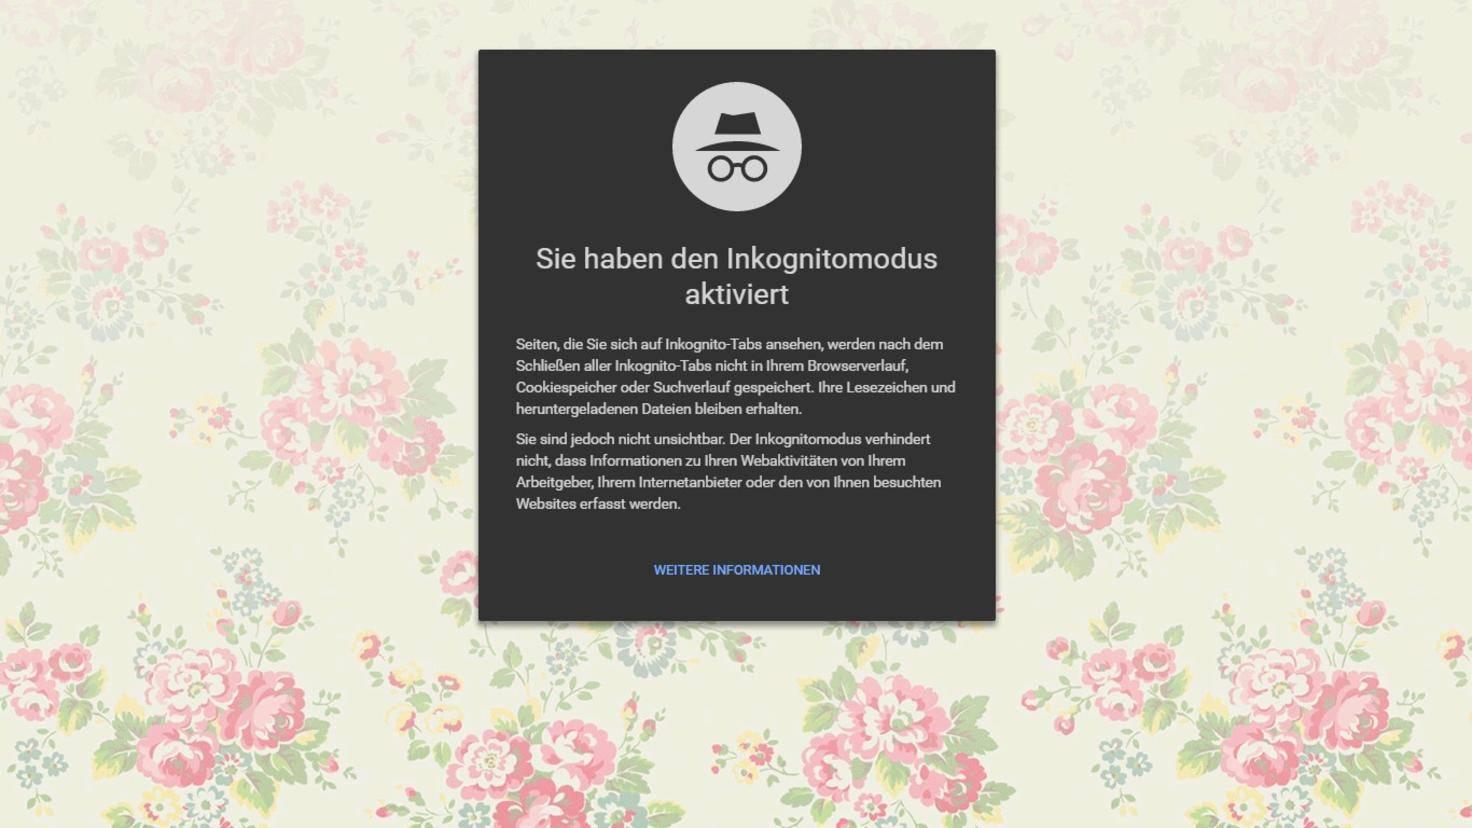 7 Geheime Befehle Fur Google Chrome